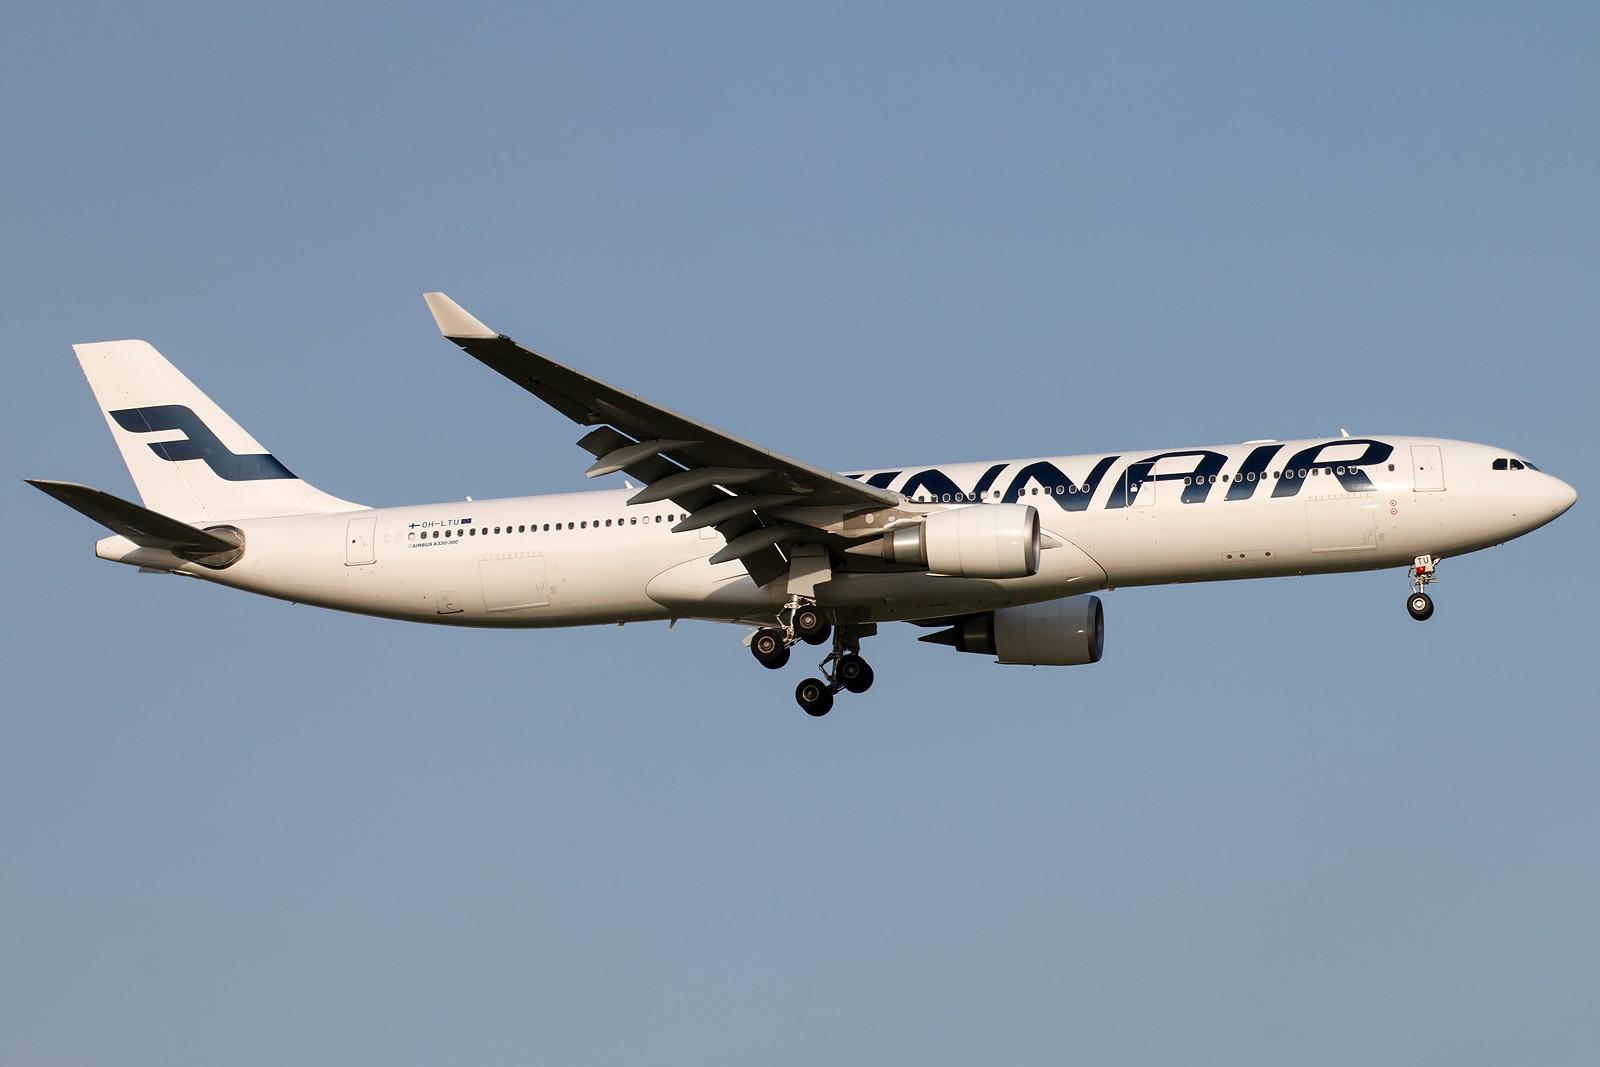 Re:[原创]晨练的季节到了 1600*1067 [8pics] AIRBUS A330-302 OH-LTU 中国北京首都国际机场